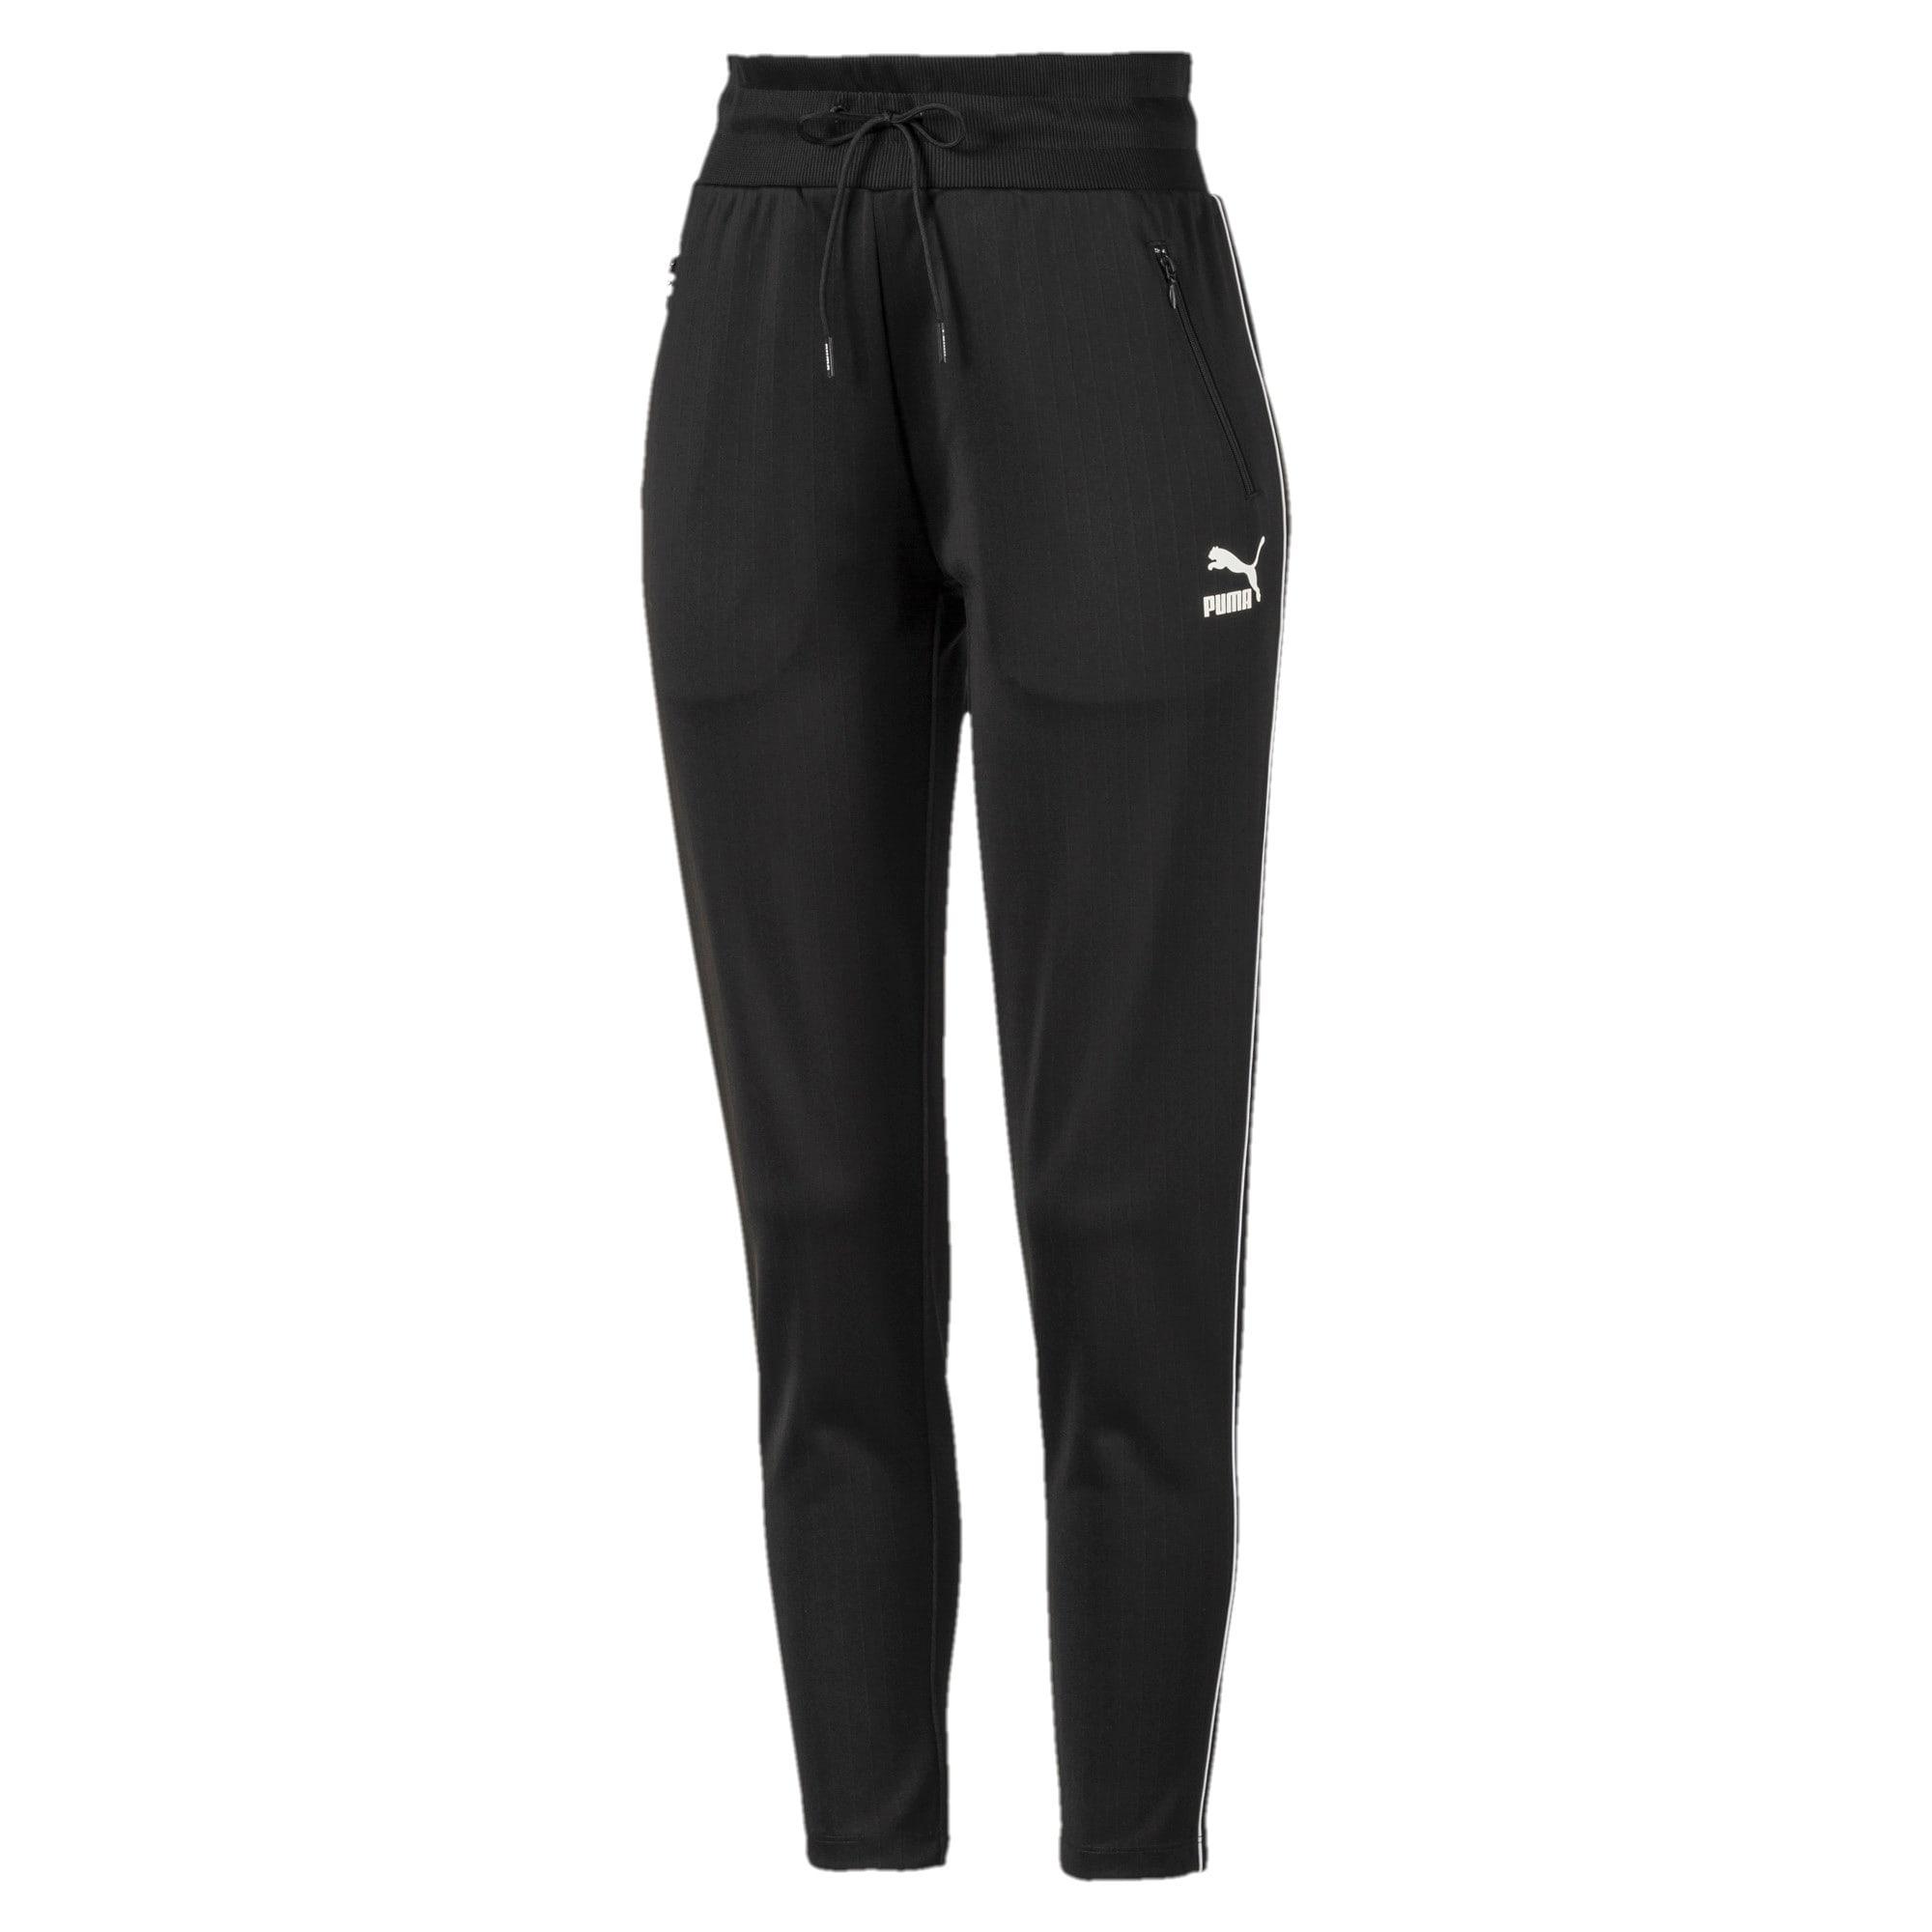 Thumbnail 1 of Classics Poly Knitted Women's Track Pants, Puma Black, medium